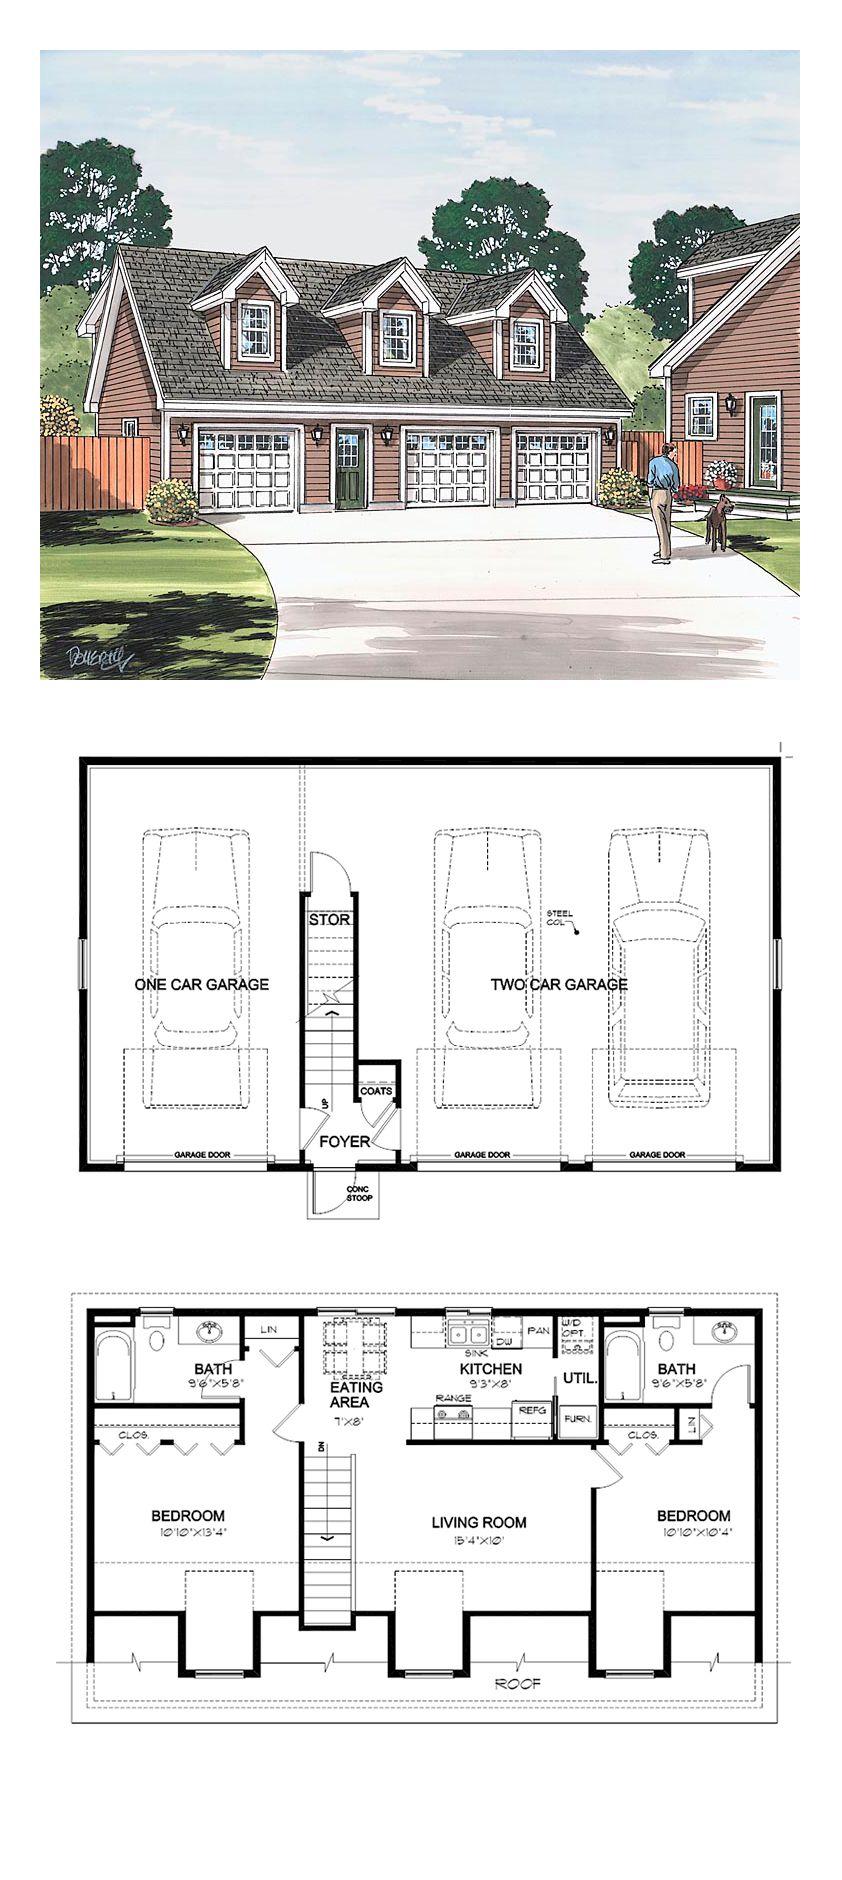 Garage Apartment Plan 30032 Total Living Area 887 Sq Ft